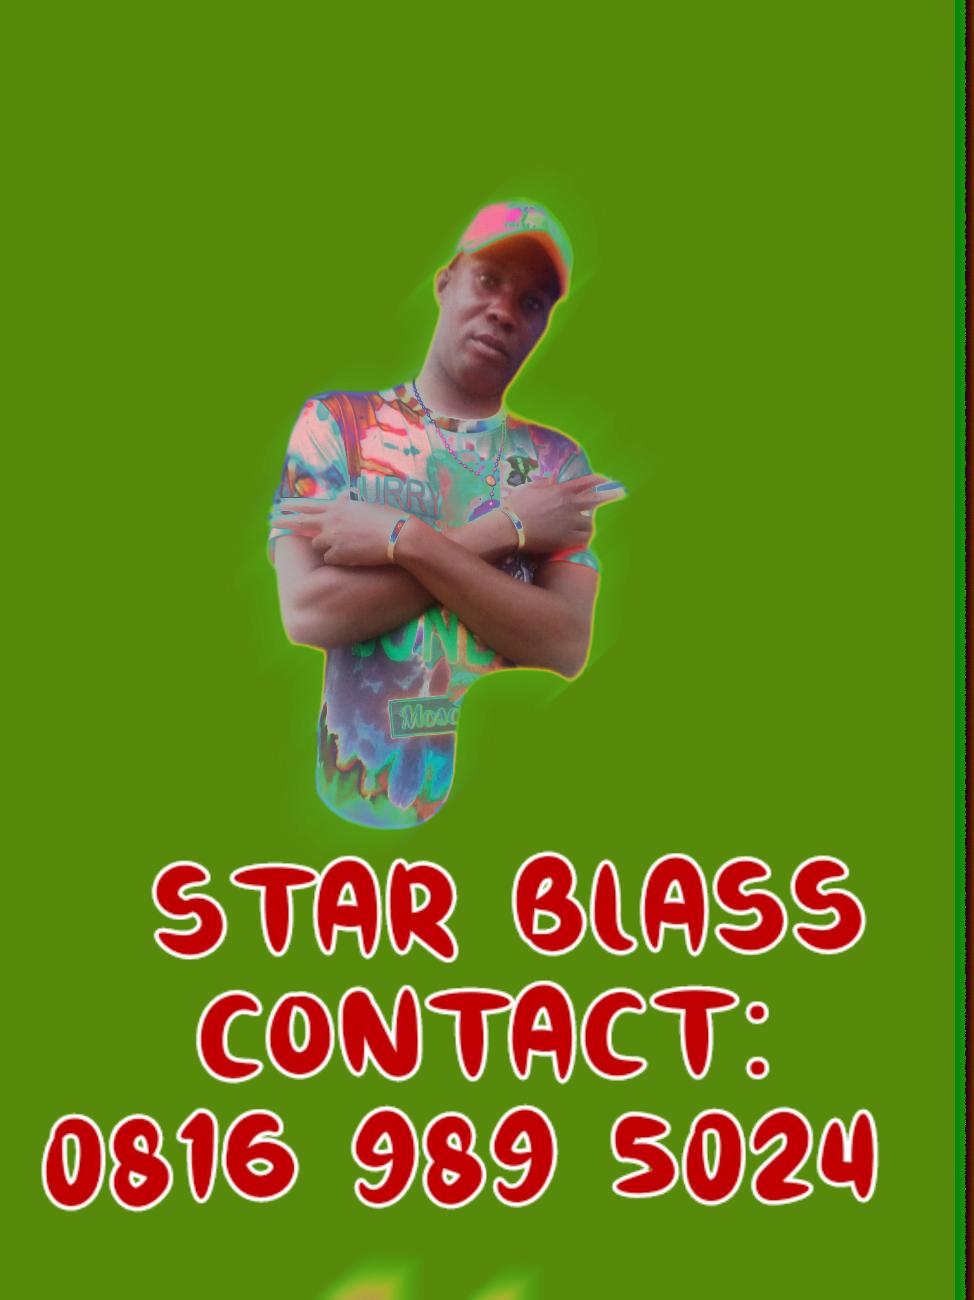 Star blass - Baby Girl